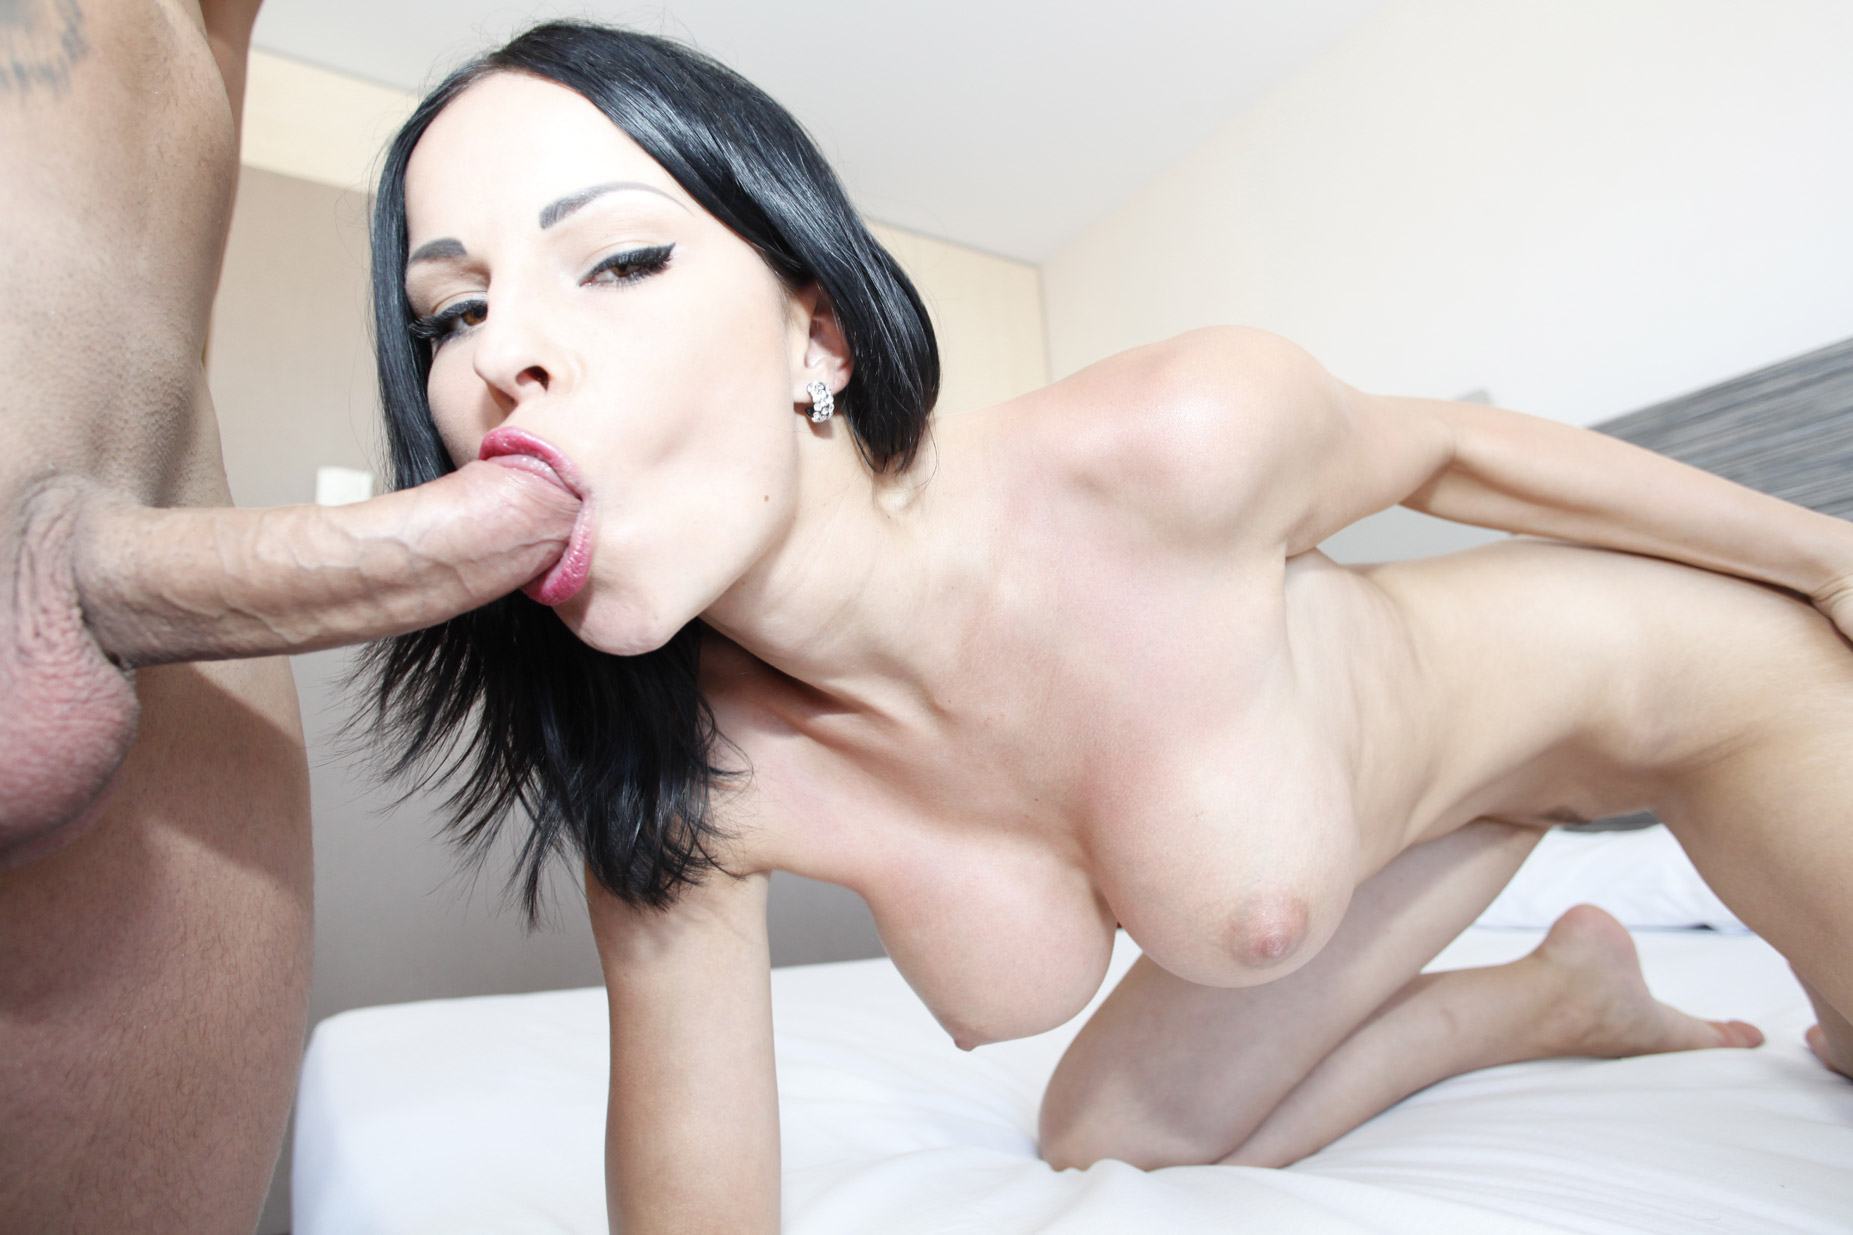 Sunny leon pornou - 2527 Video Pornografa gratis